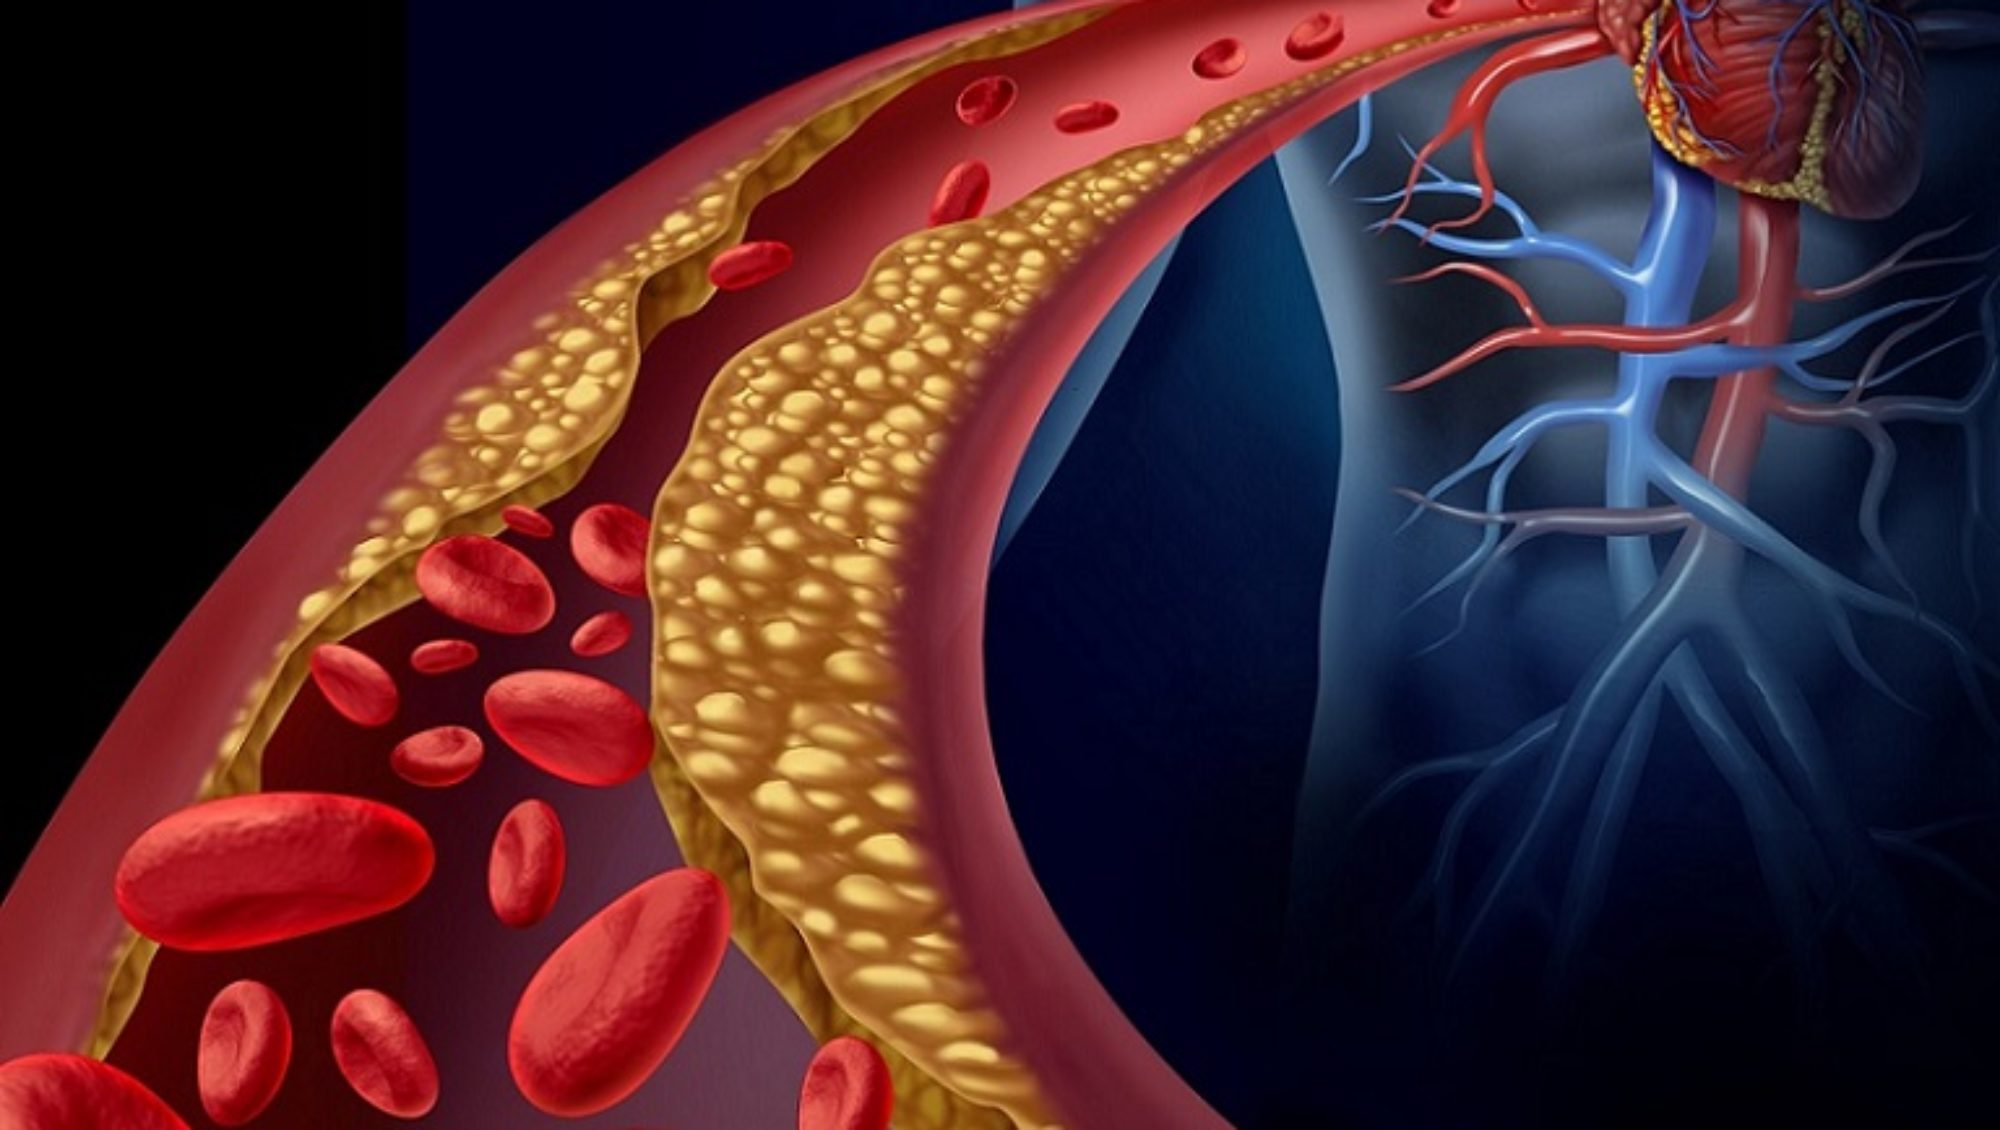 Las dislipidemias-arterias-IMOBariatrica (media)